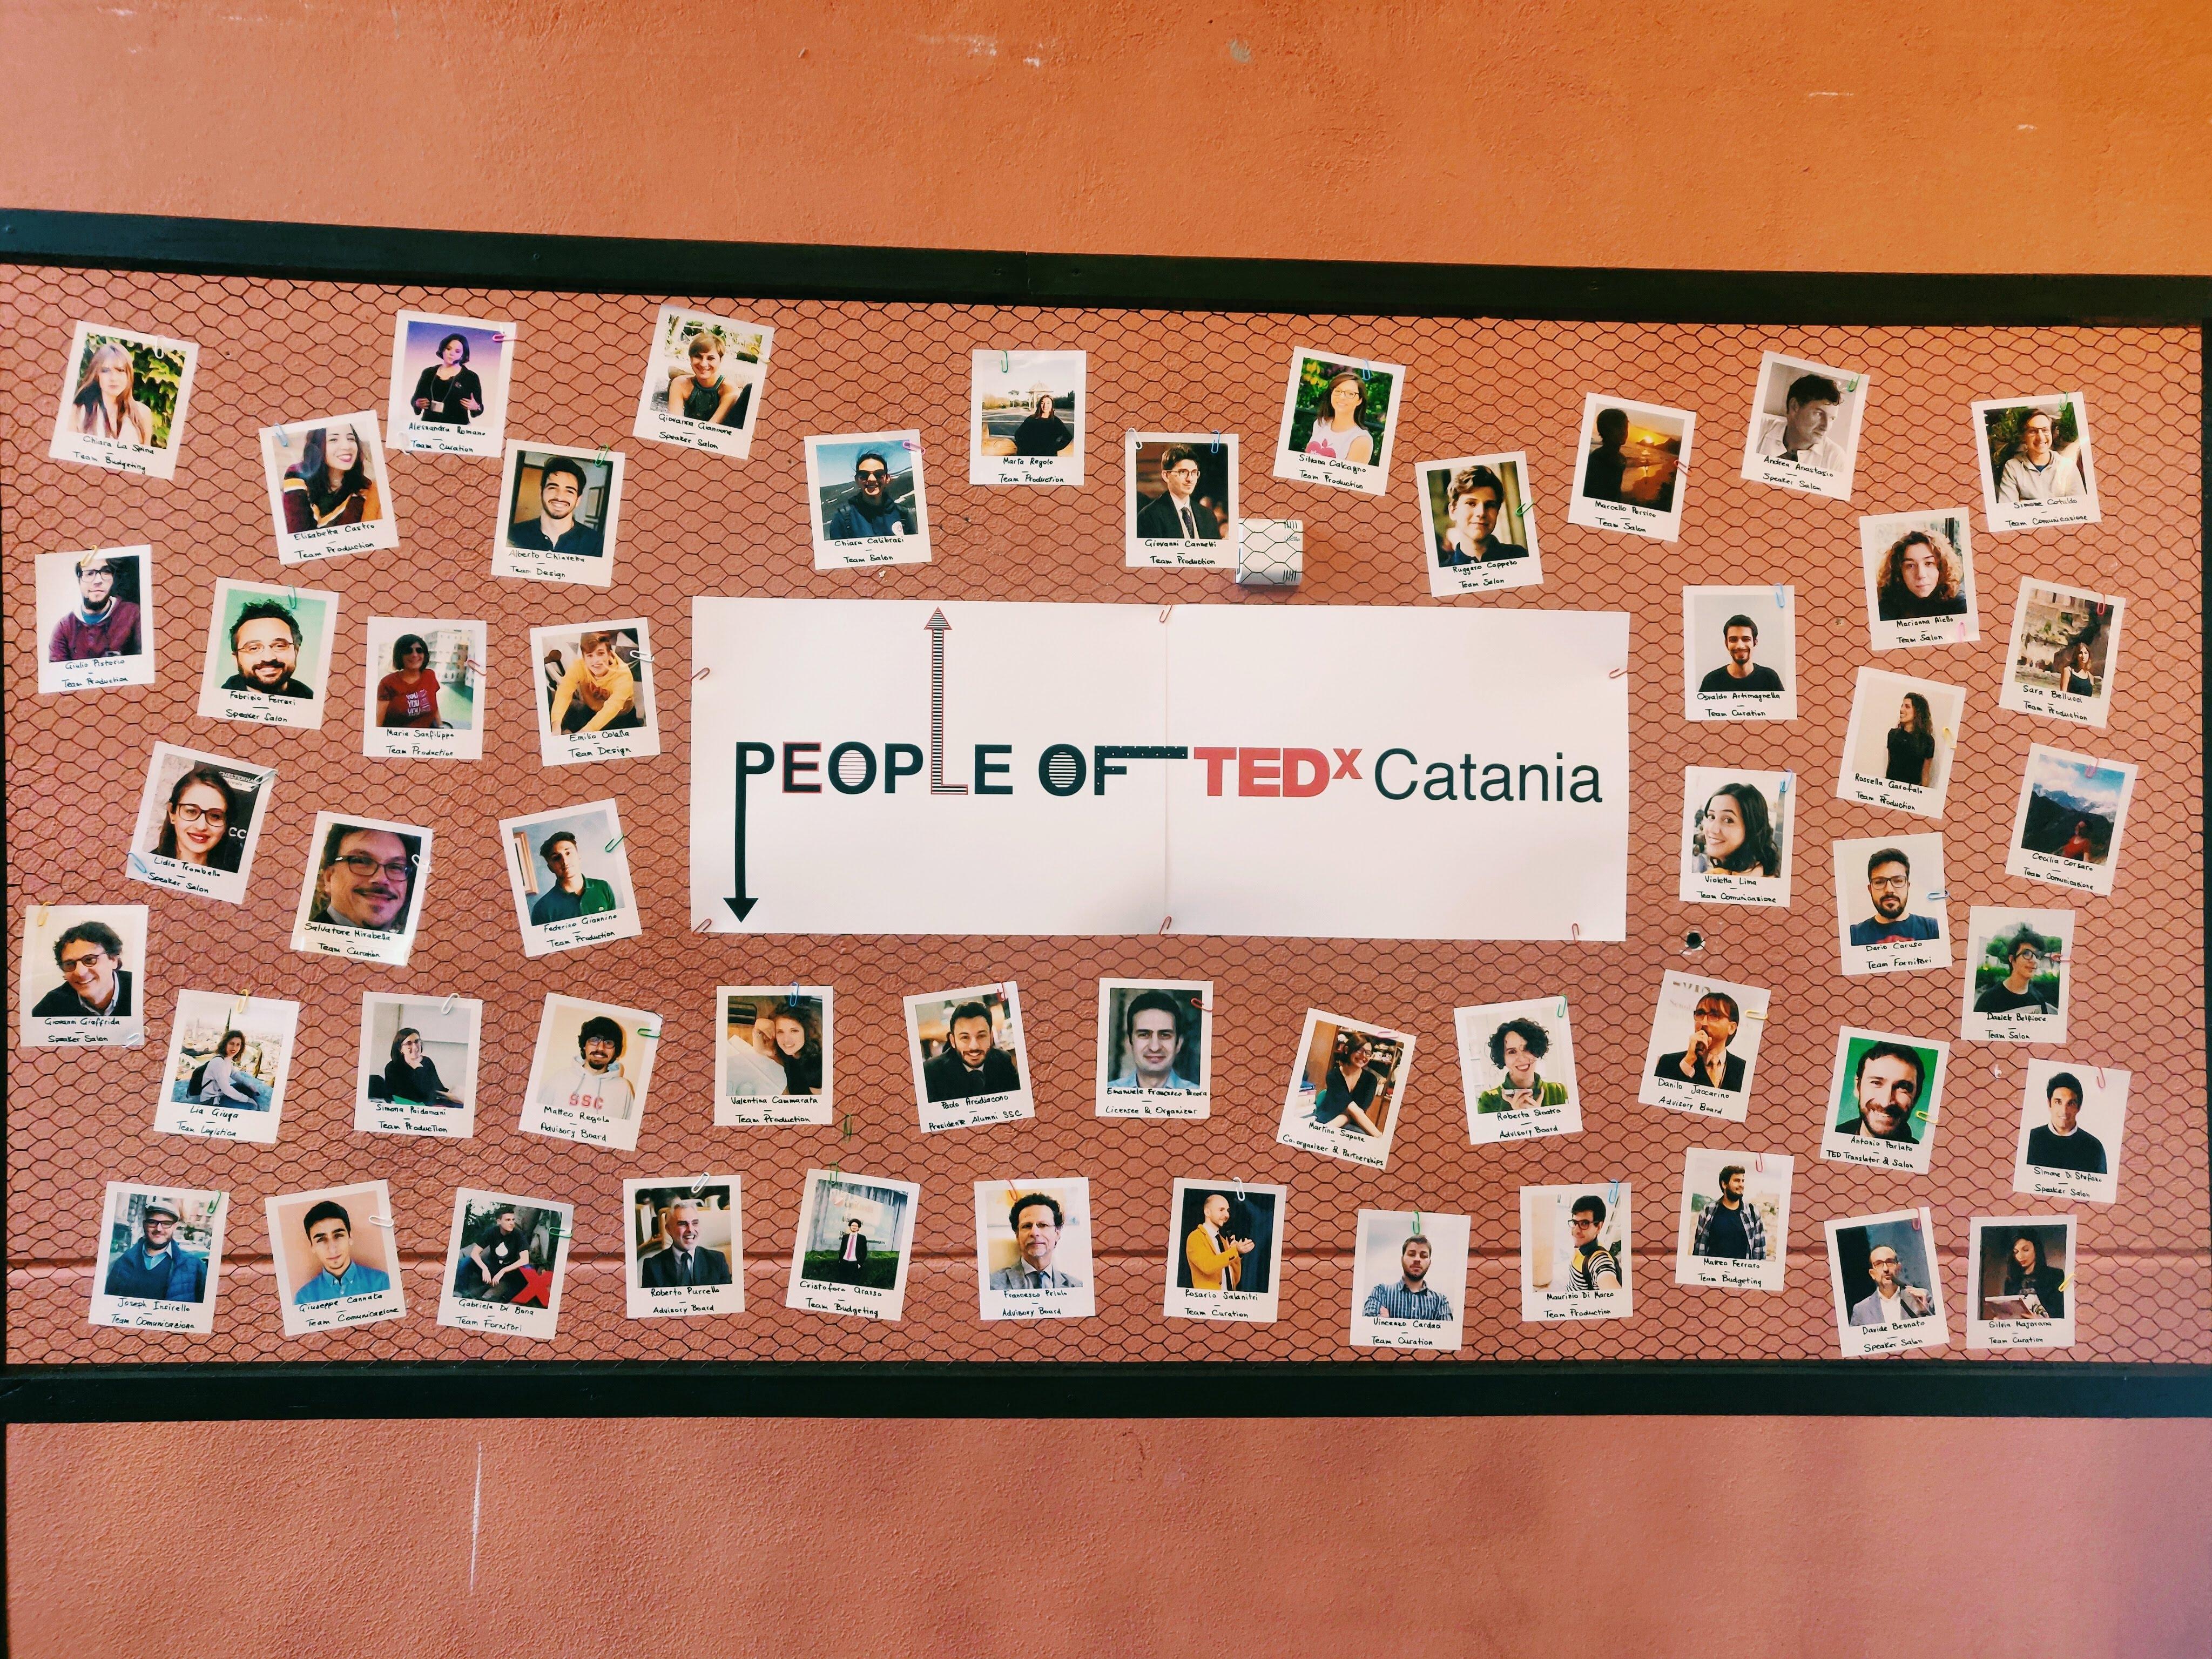 TEDxCatania 2019